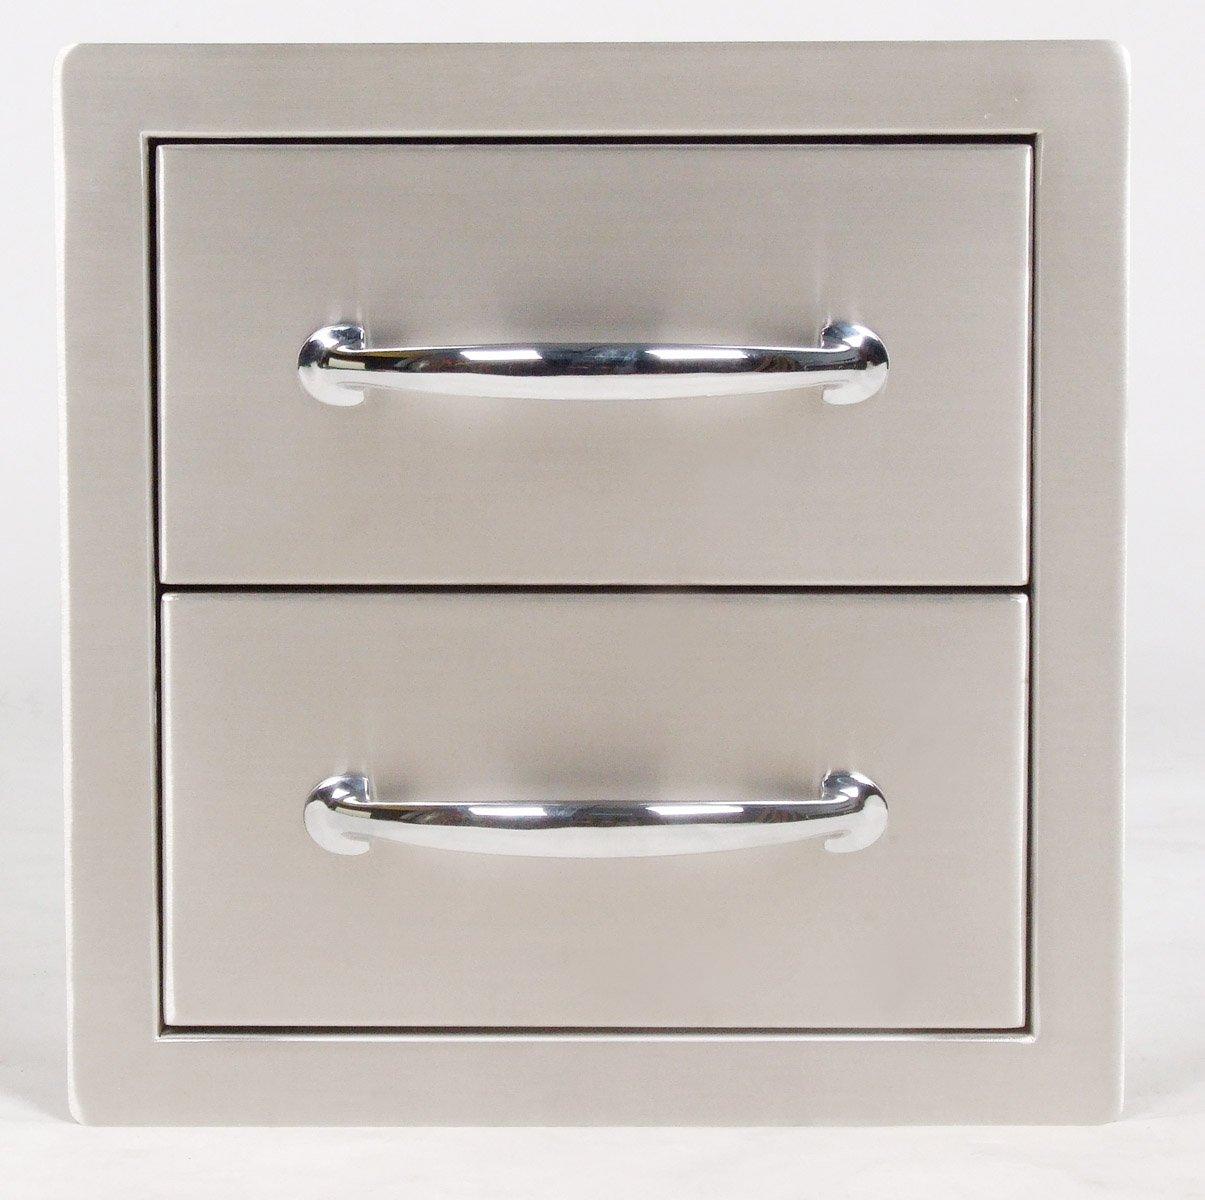 SUNSTONE B-DD12 14-Inch Flush Double Access Drawer